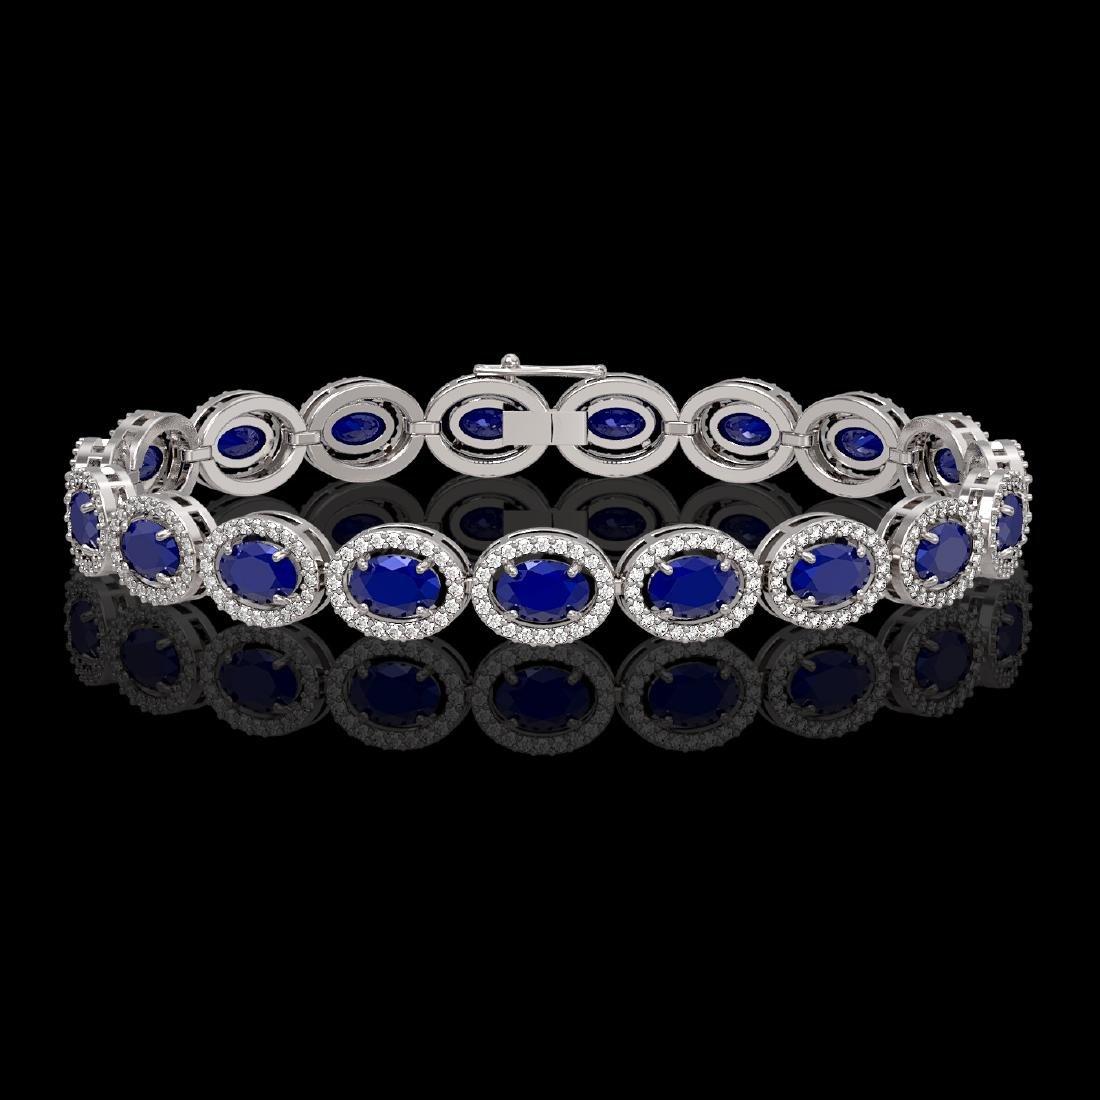 15.2 CTW Sapphire & Diamond Halo Bracelet 10K White